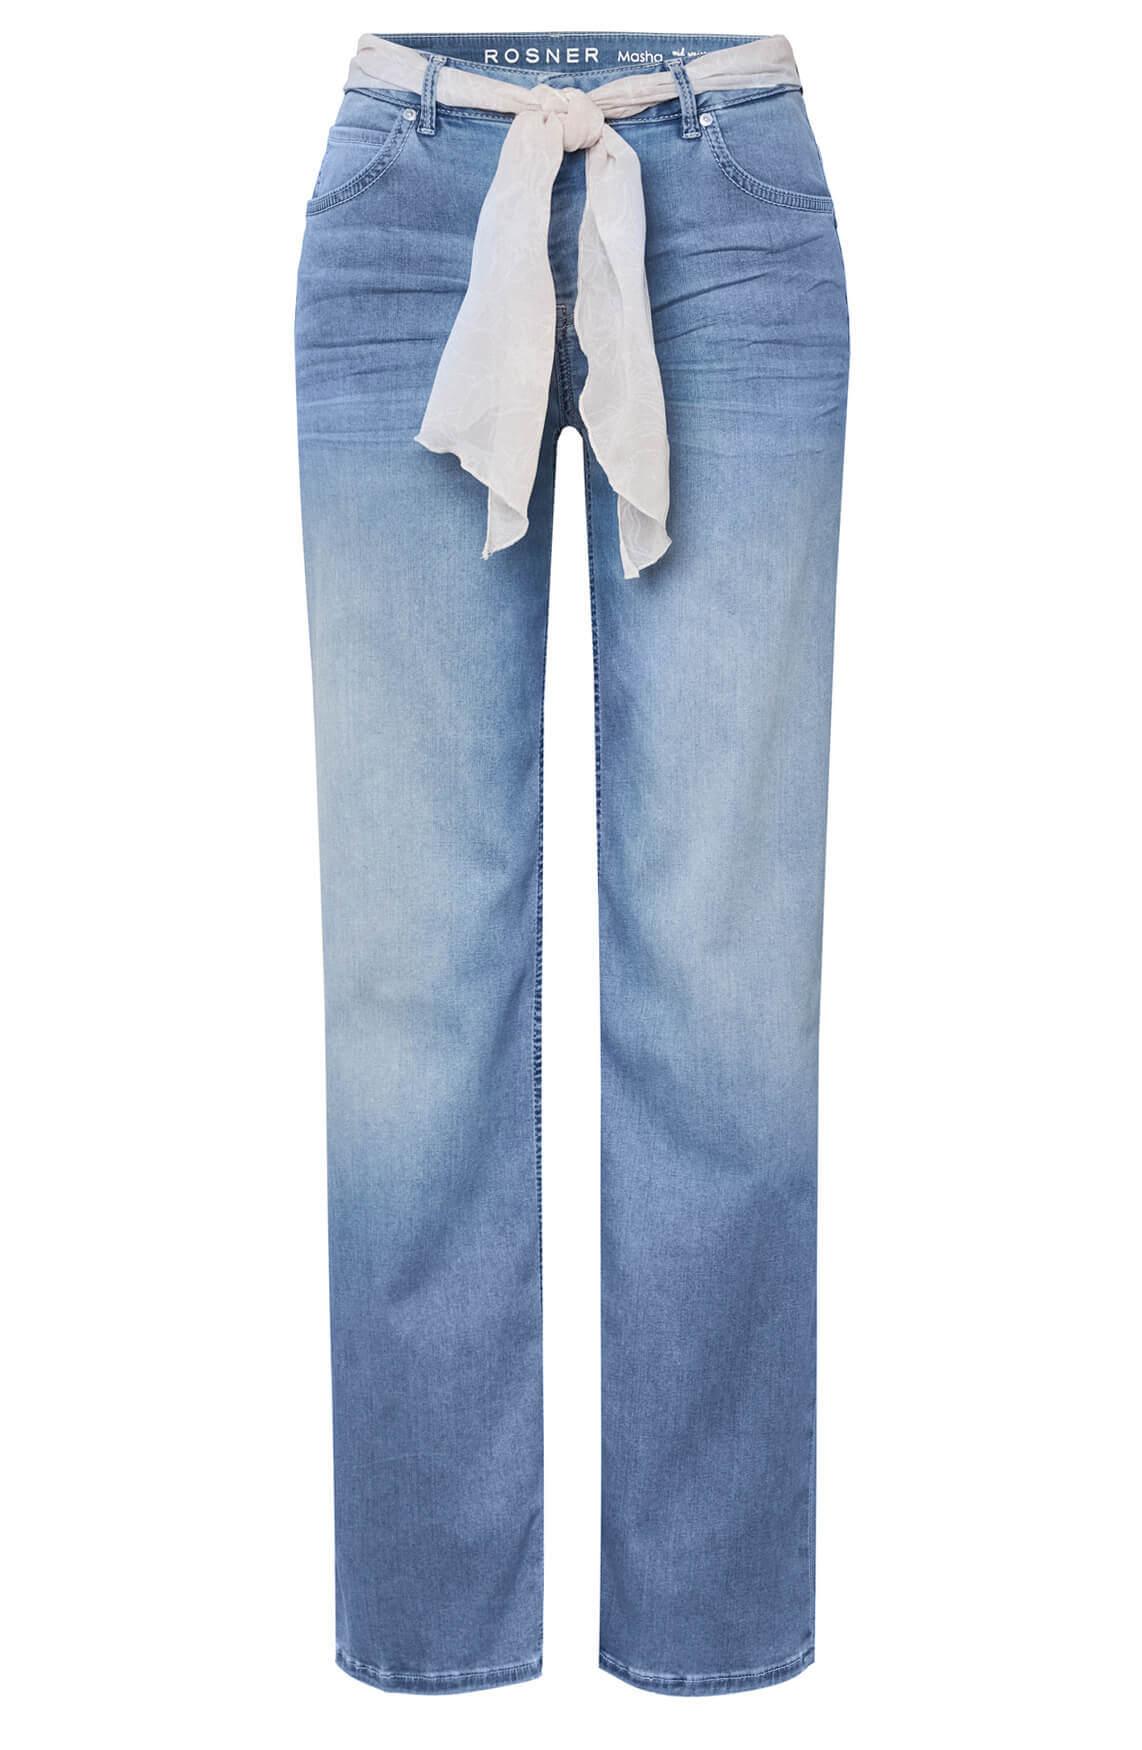 Rosner Dames Masha flared jeans Blauw